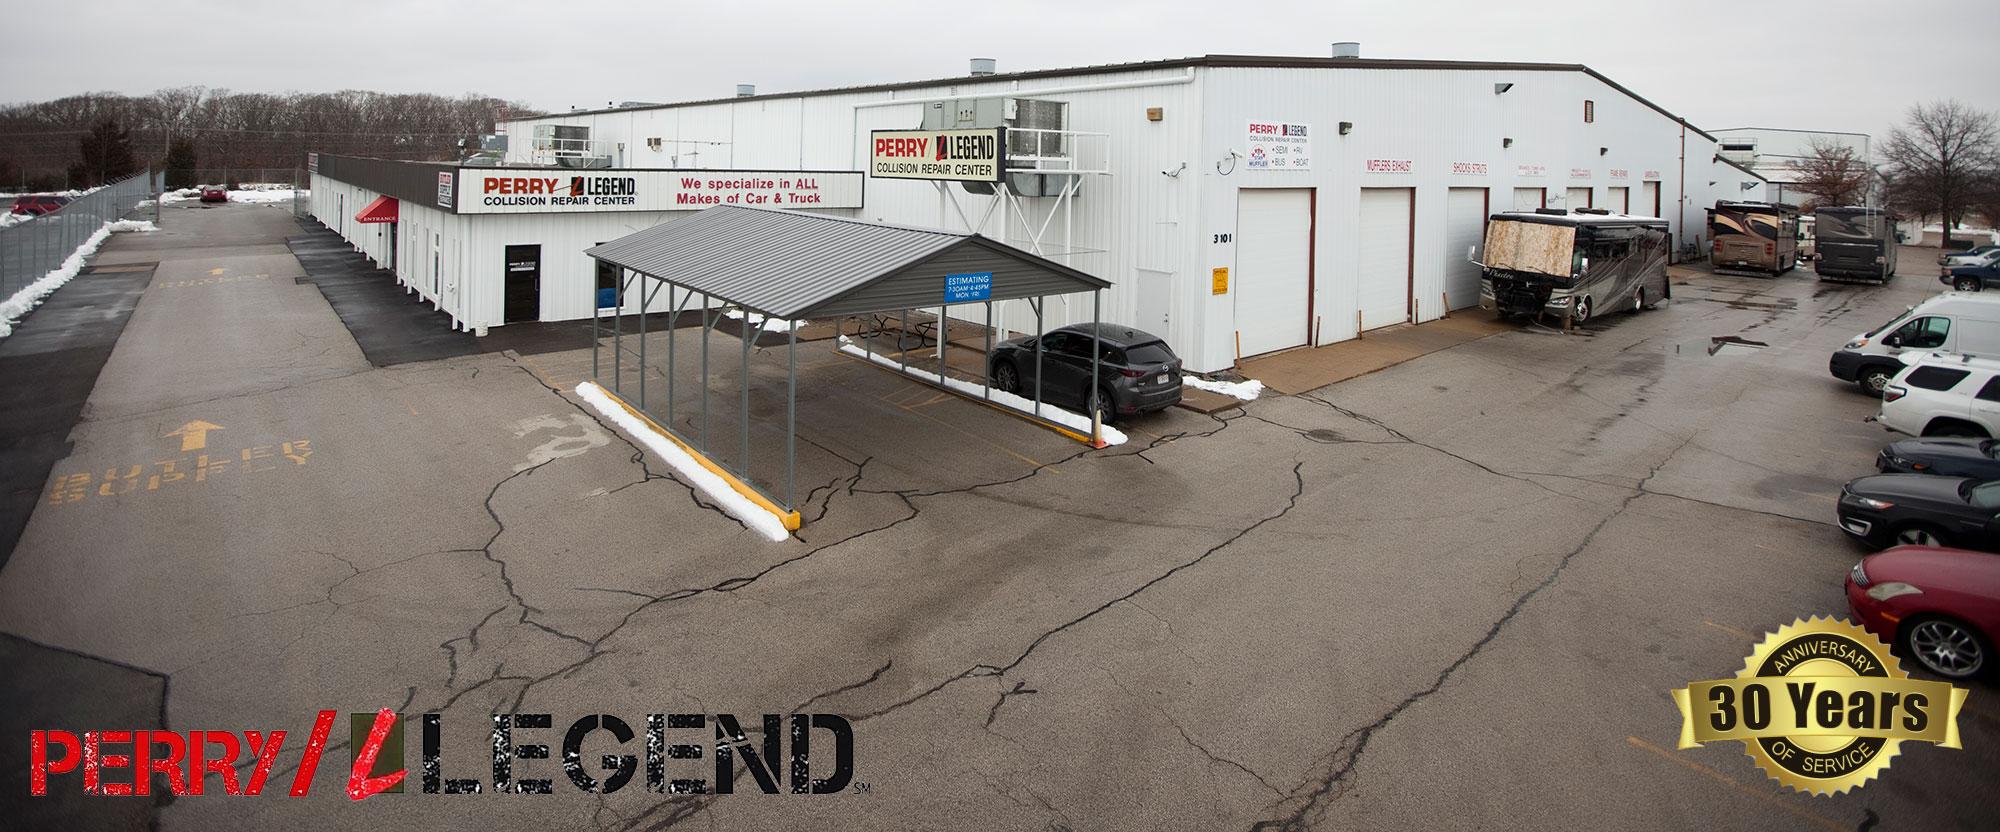 Perry Legend Collision Large Vehicle Repair Center Big Rigs Semis Trucks Buses Trailers Coaches Dump Trucks in Columbia Missouri